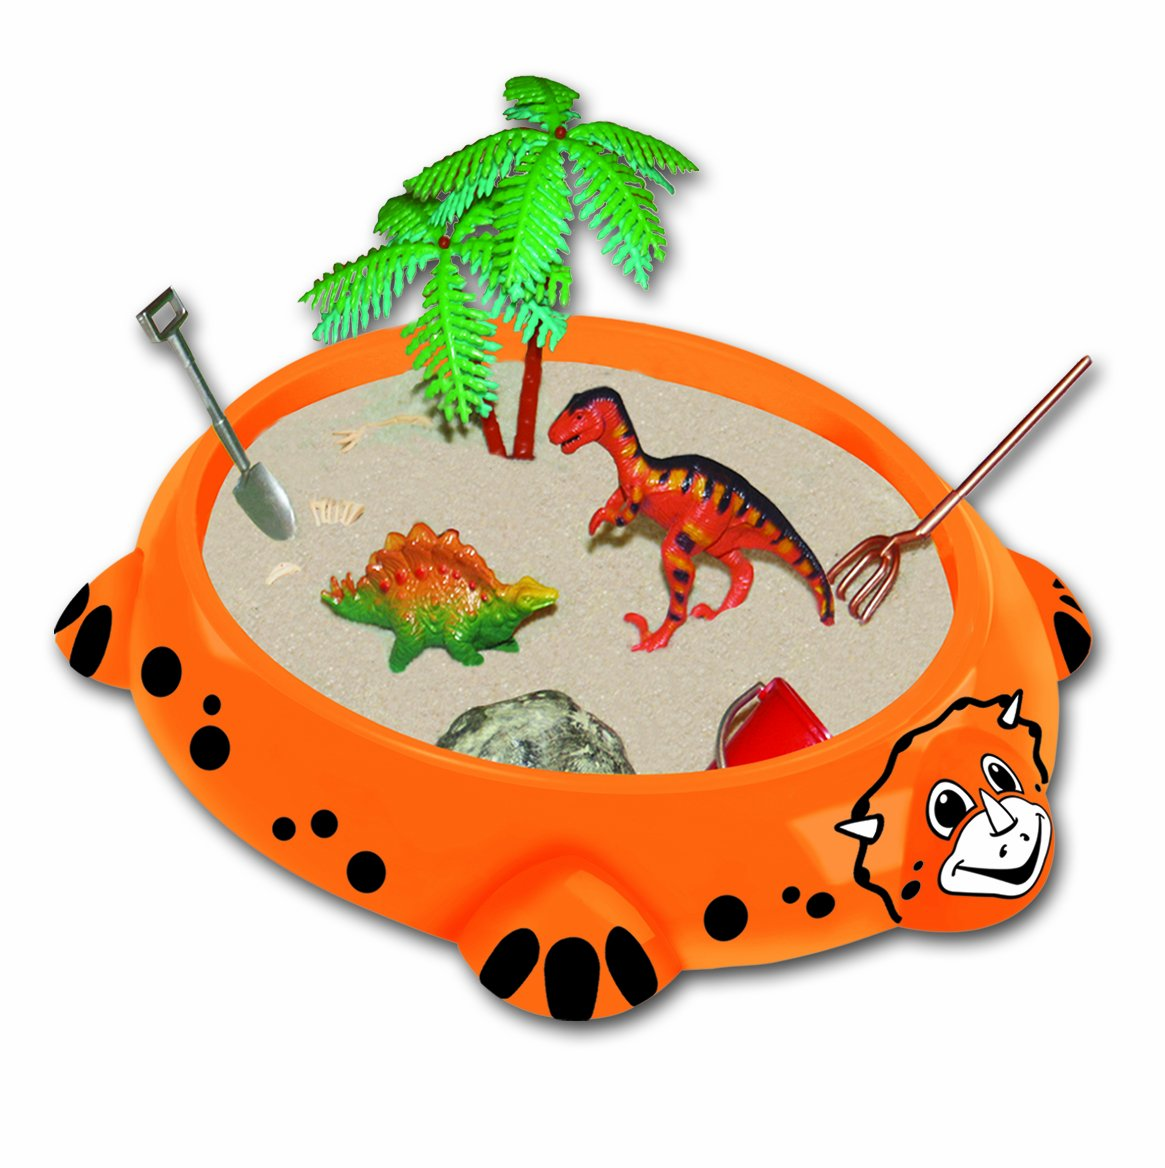 Be Good Company Critters Dinosaur Sandbox Playset by Be Good Company (Image #1)